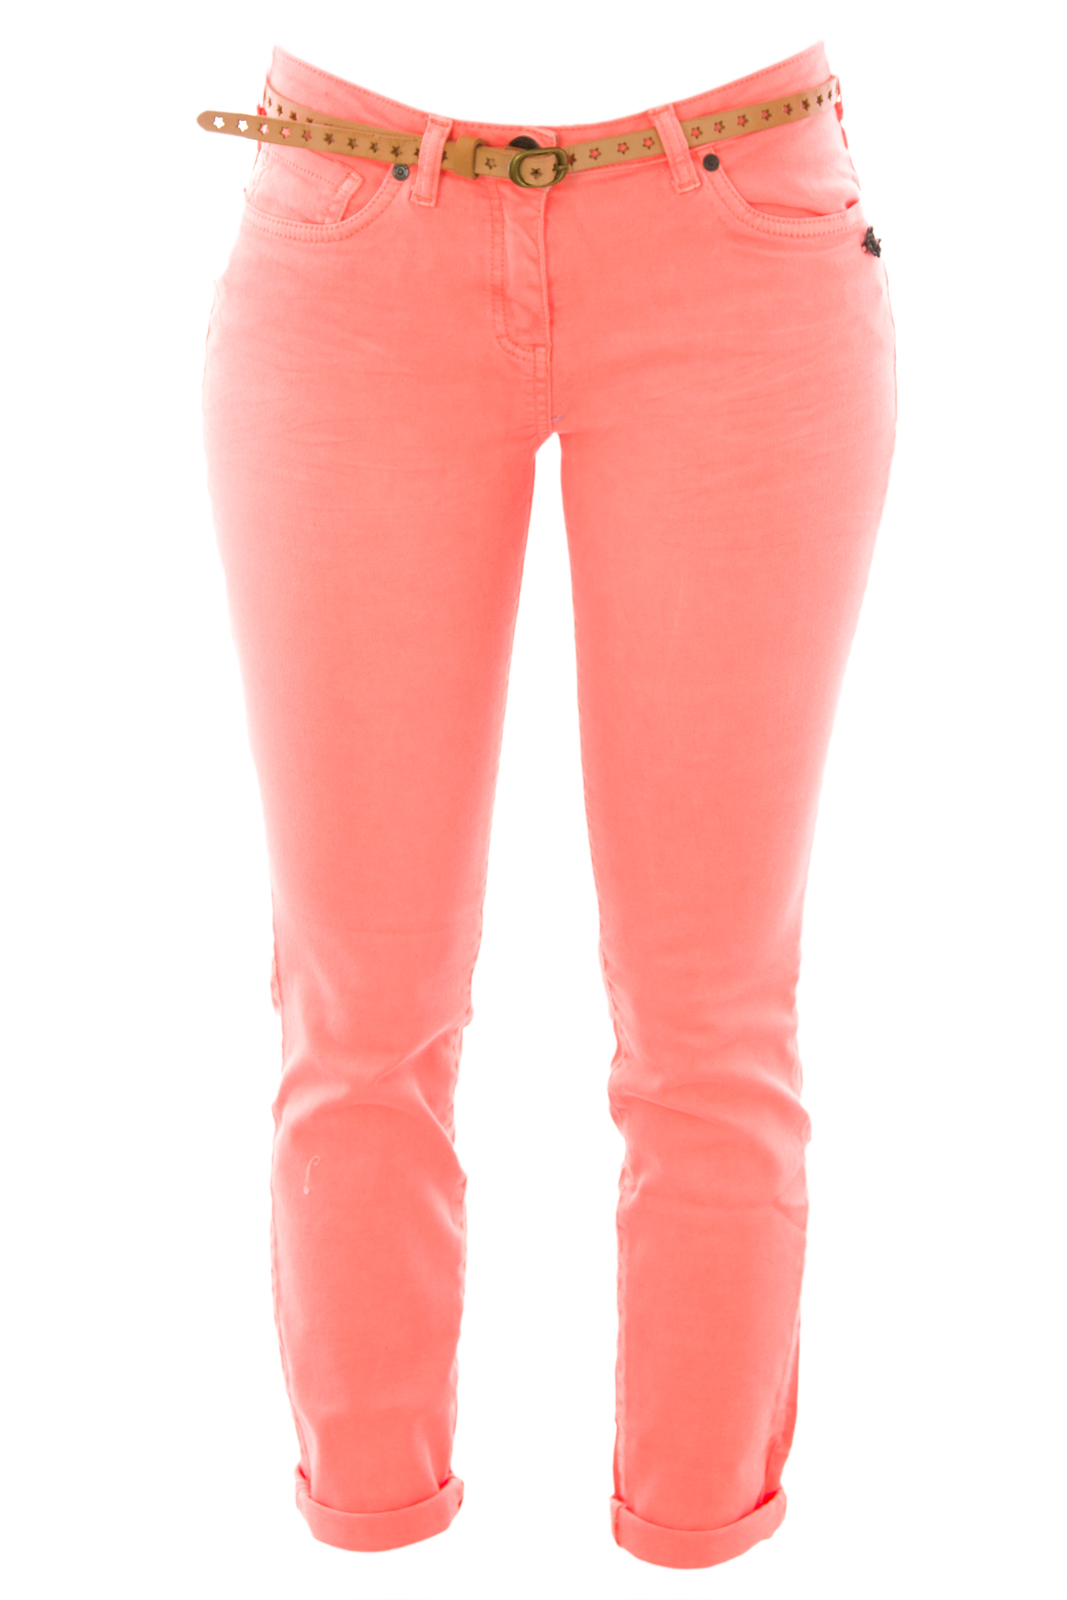 Scotch & Soda Maison Scotch Women's Belted Skinny Jeans